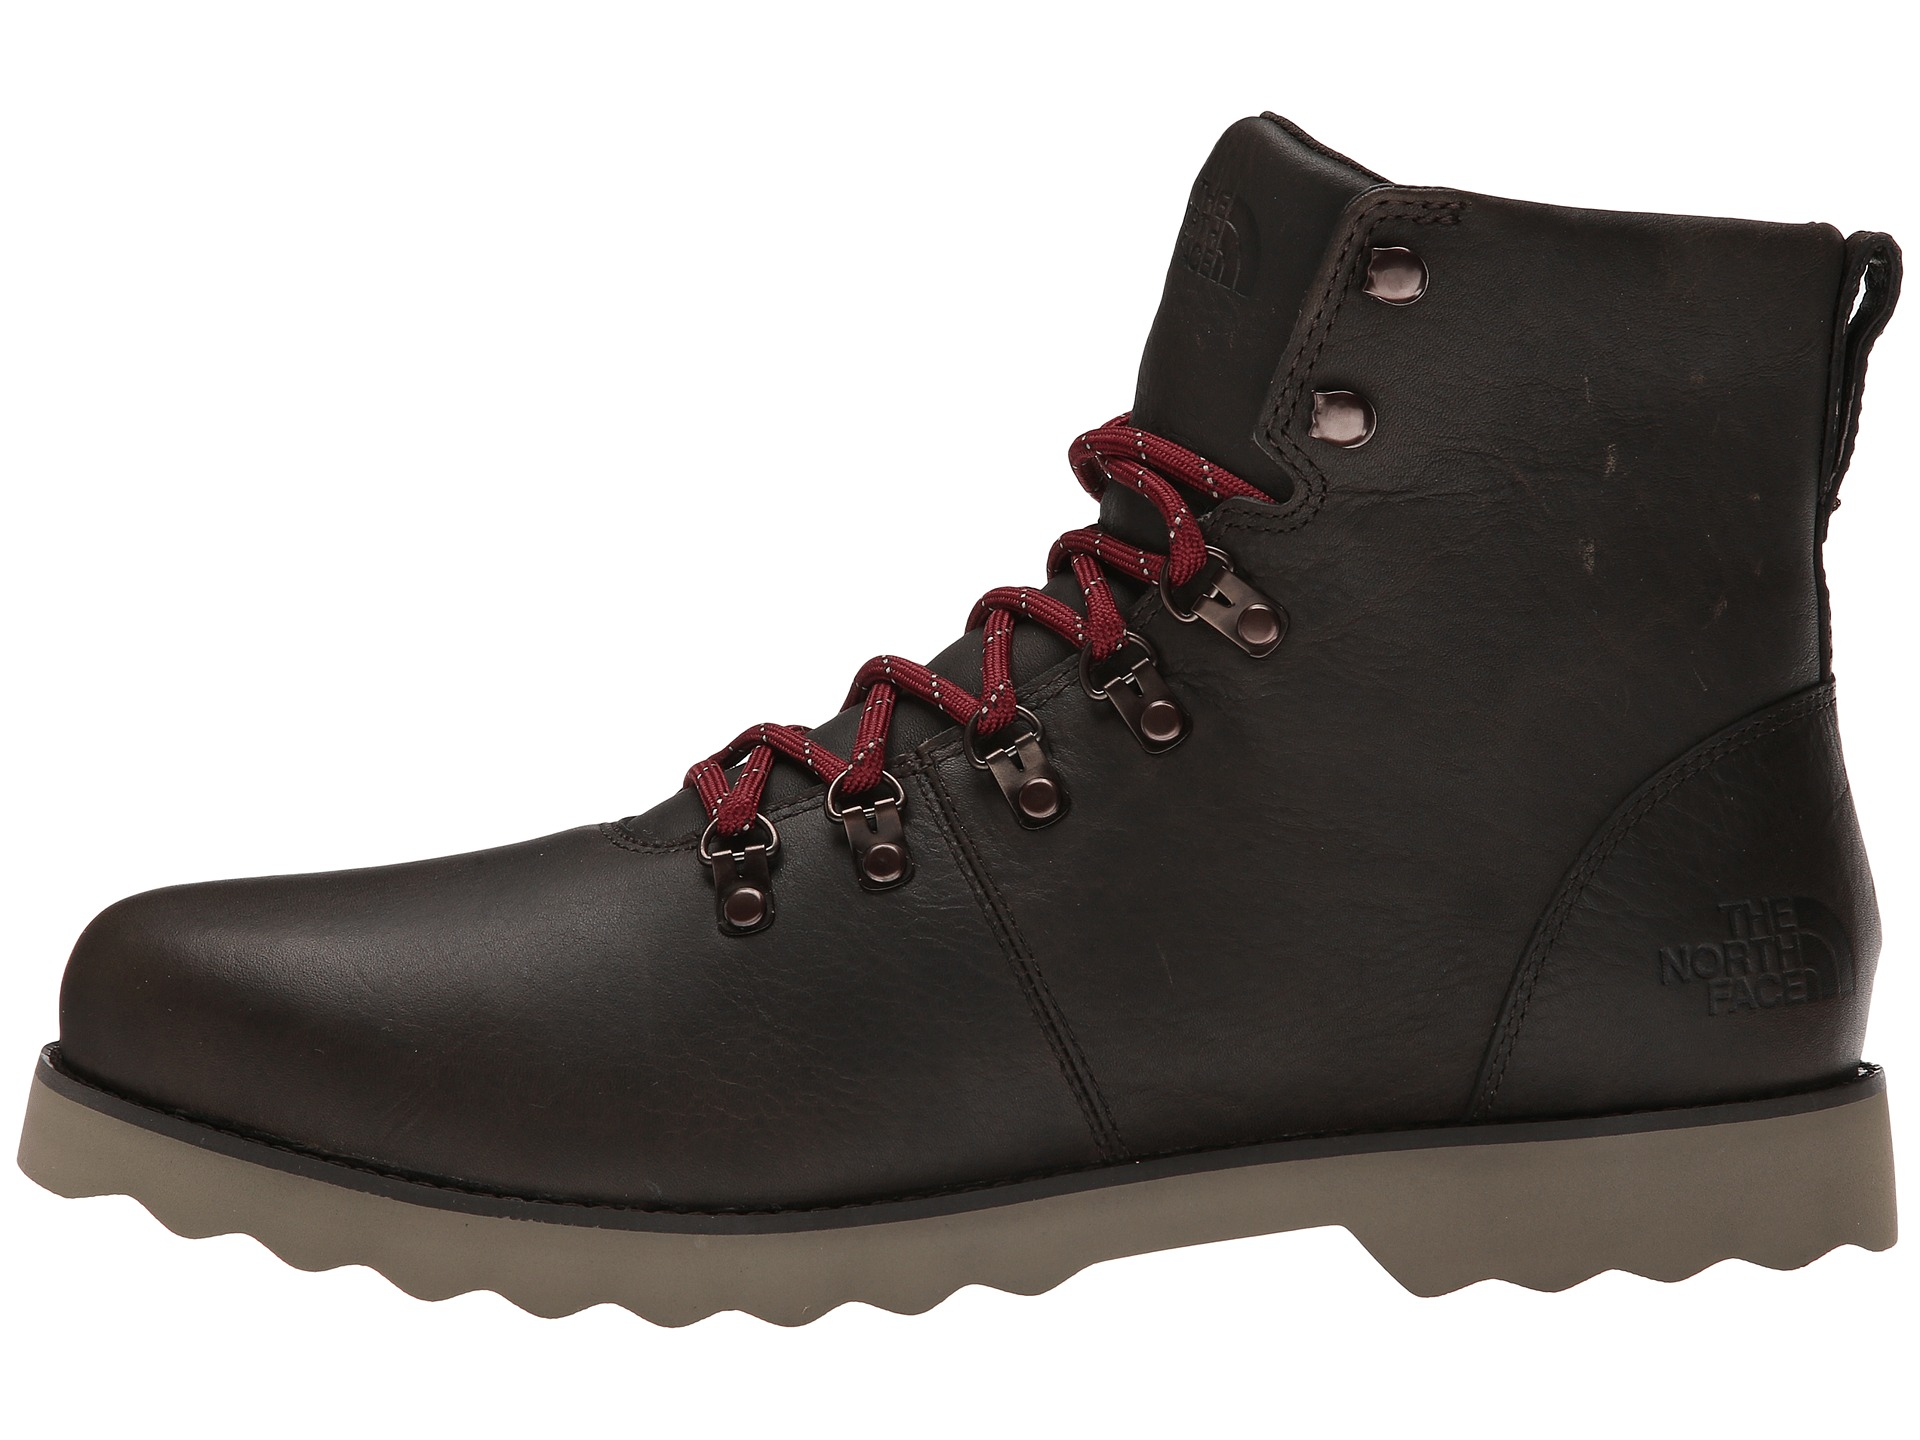 The North Face Leather Ballard Ii in